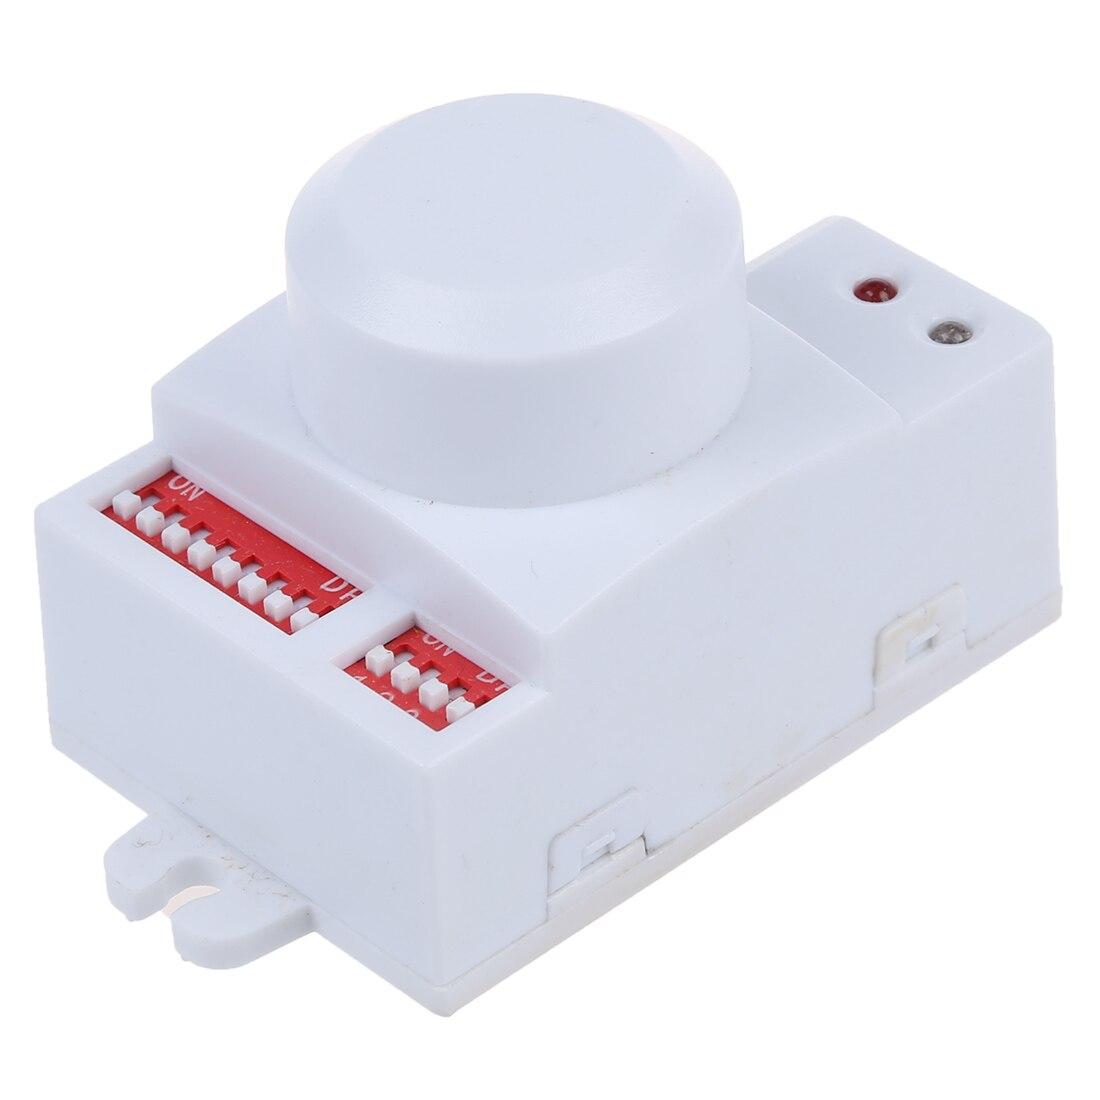 все цены на WSFS Hot Microwave motion sensor switch Doppler Radar Wireless Module for lighting 220V - White онлайн